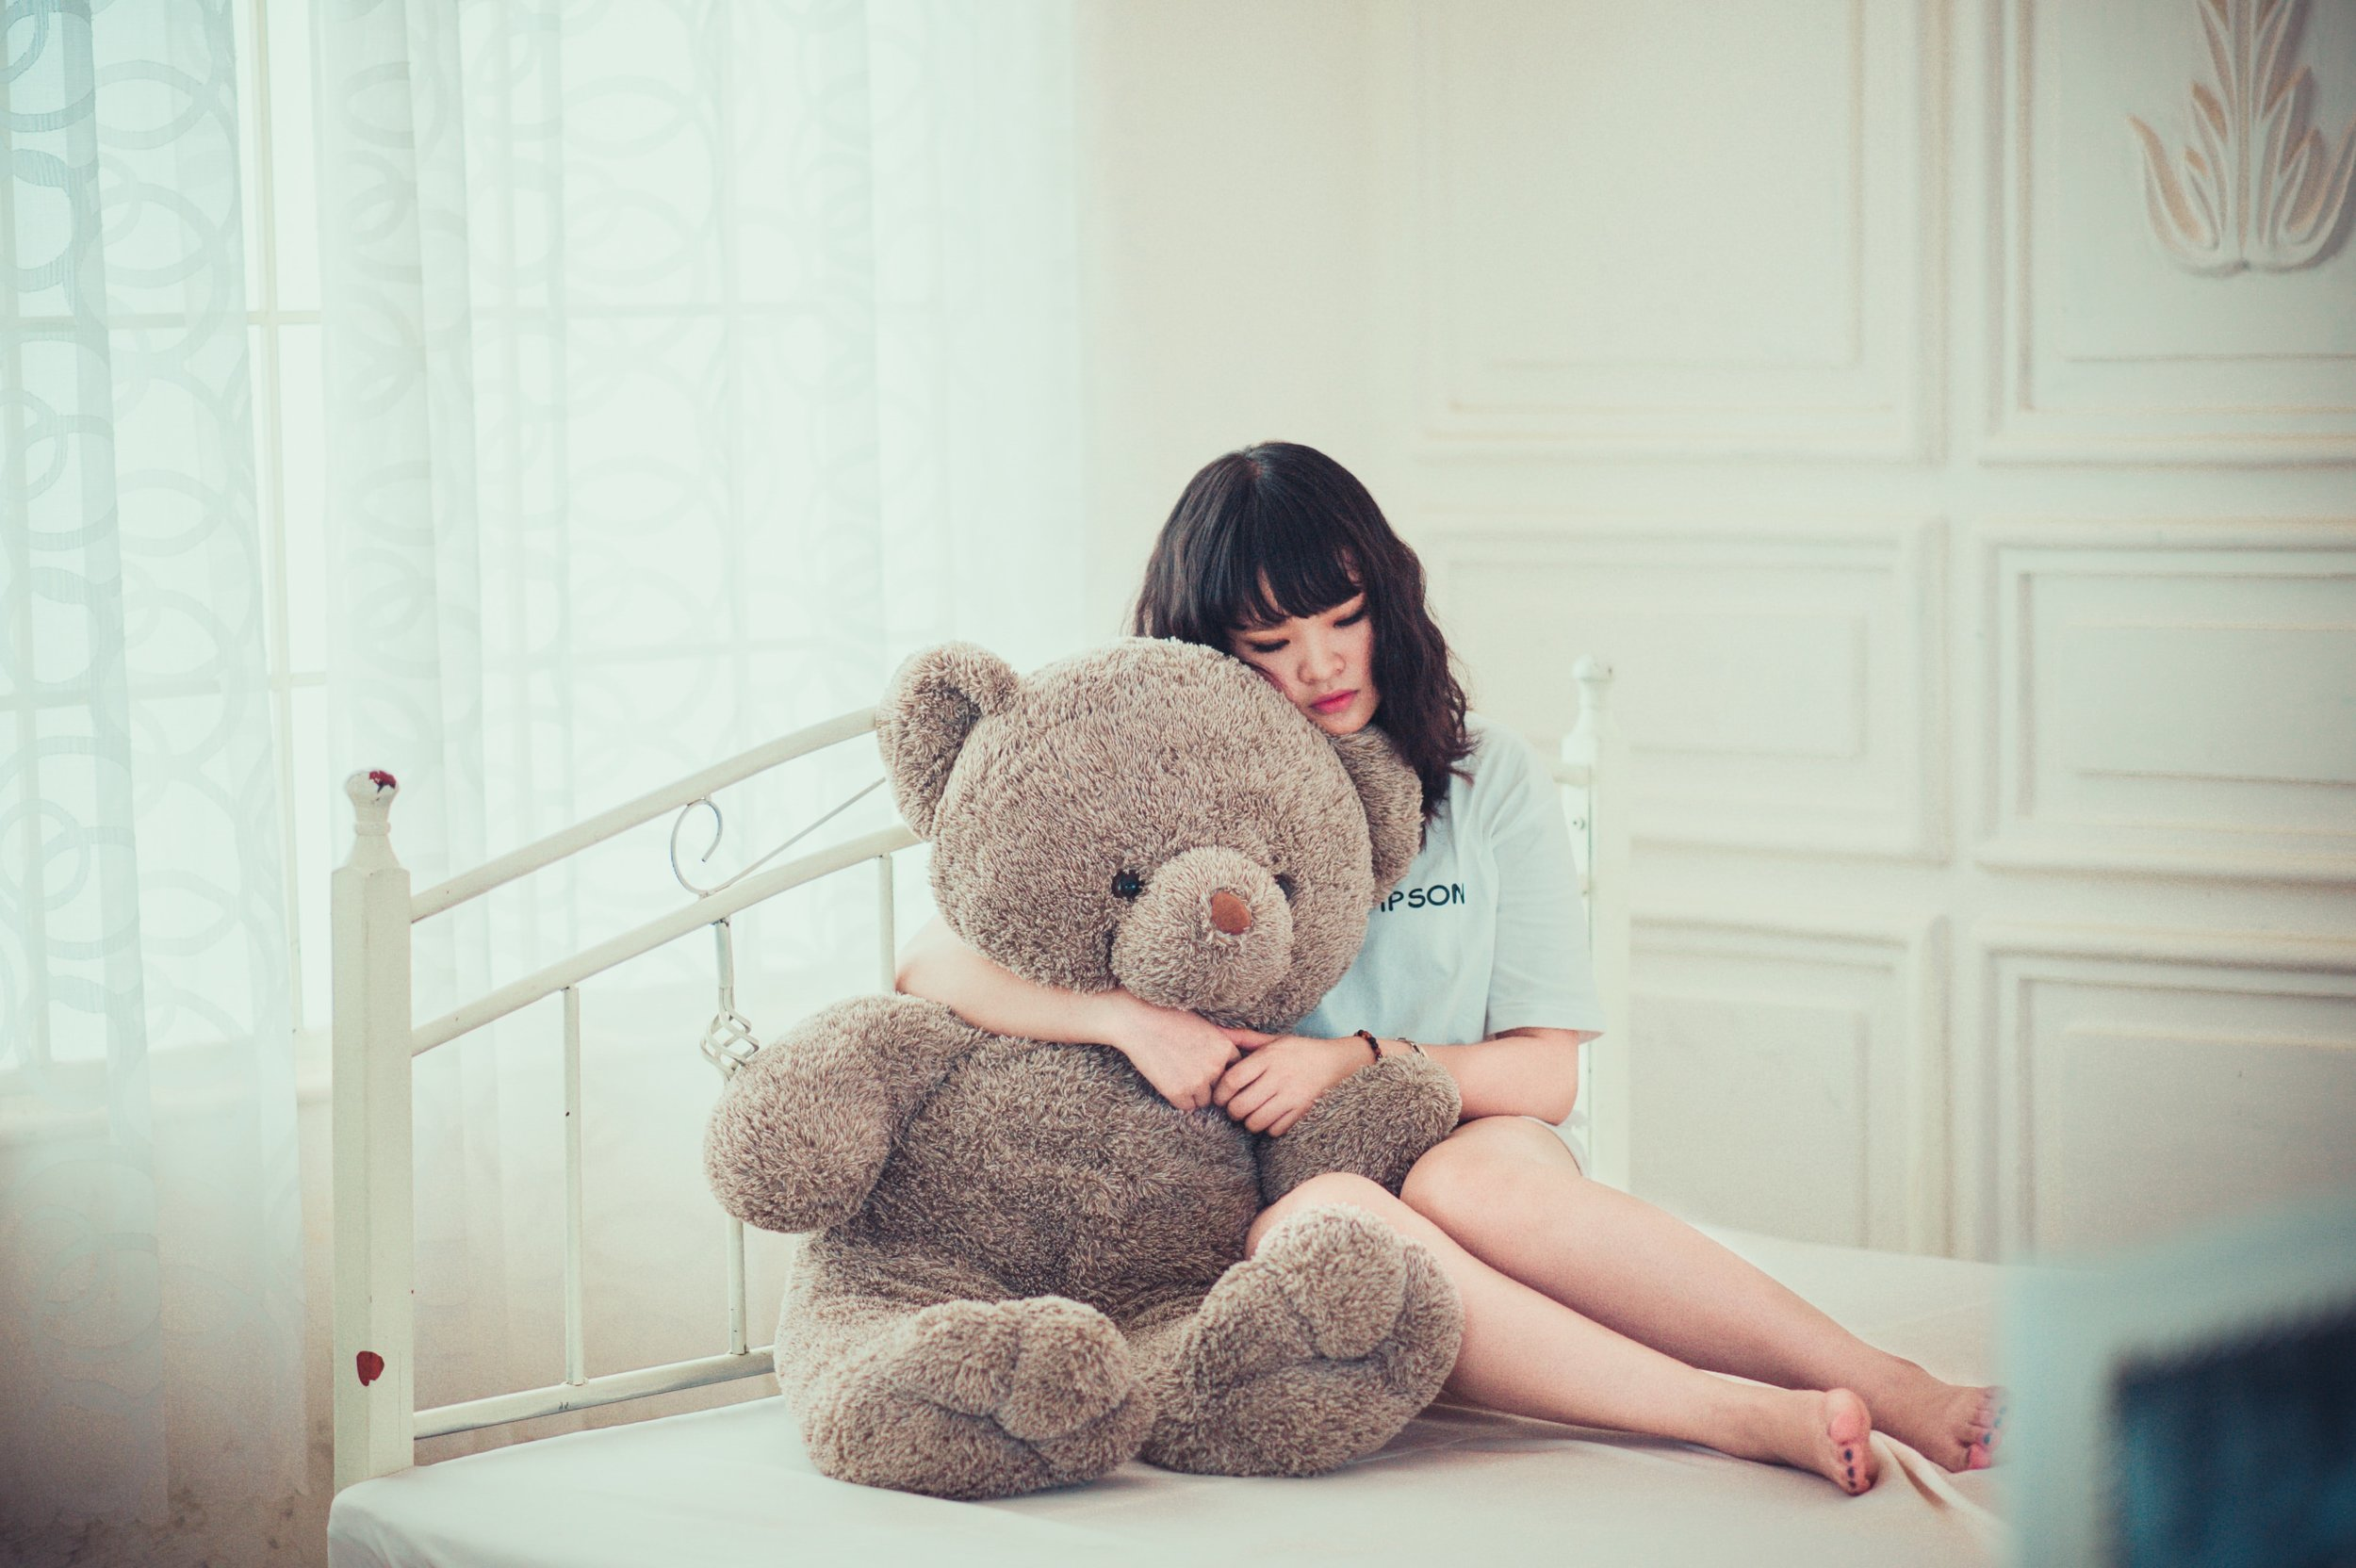 Girl Cuddling with Stuffed Bear